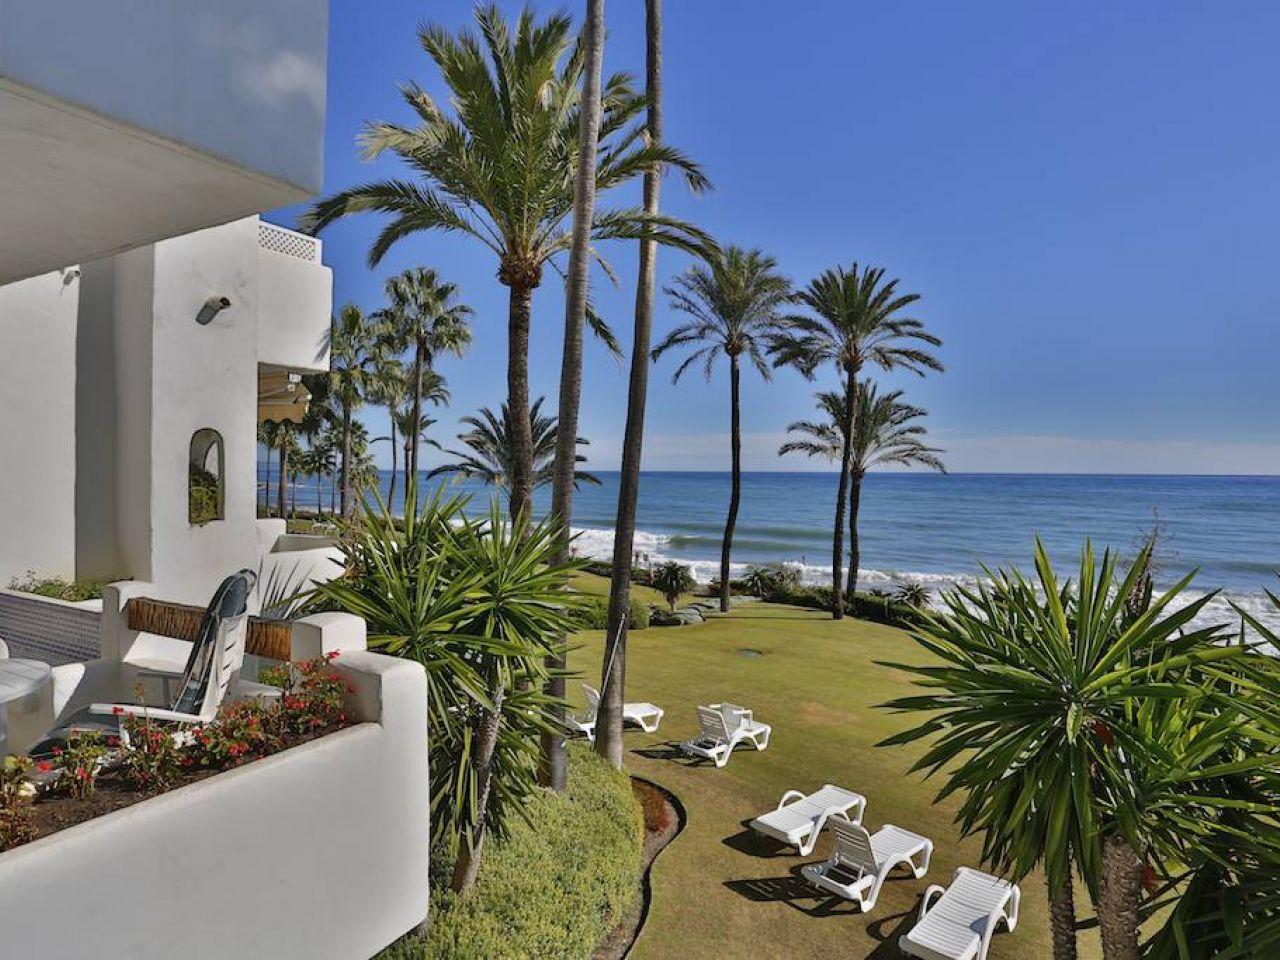 Apartment for Sale in Alcazaba Beach, Estepona